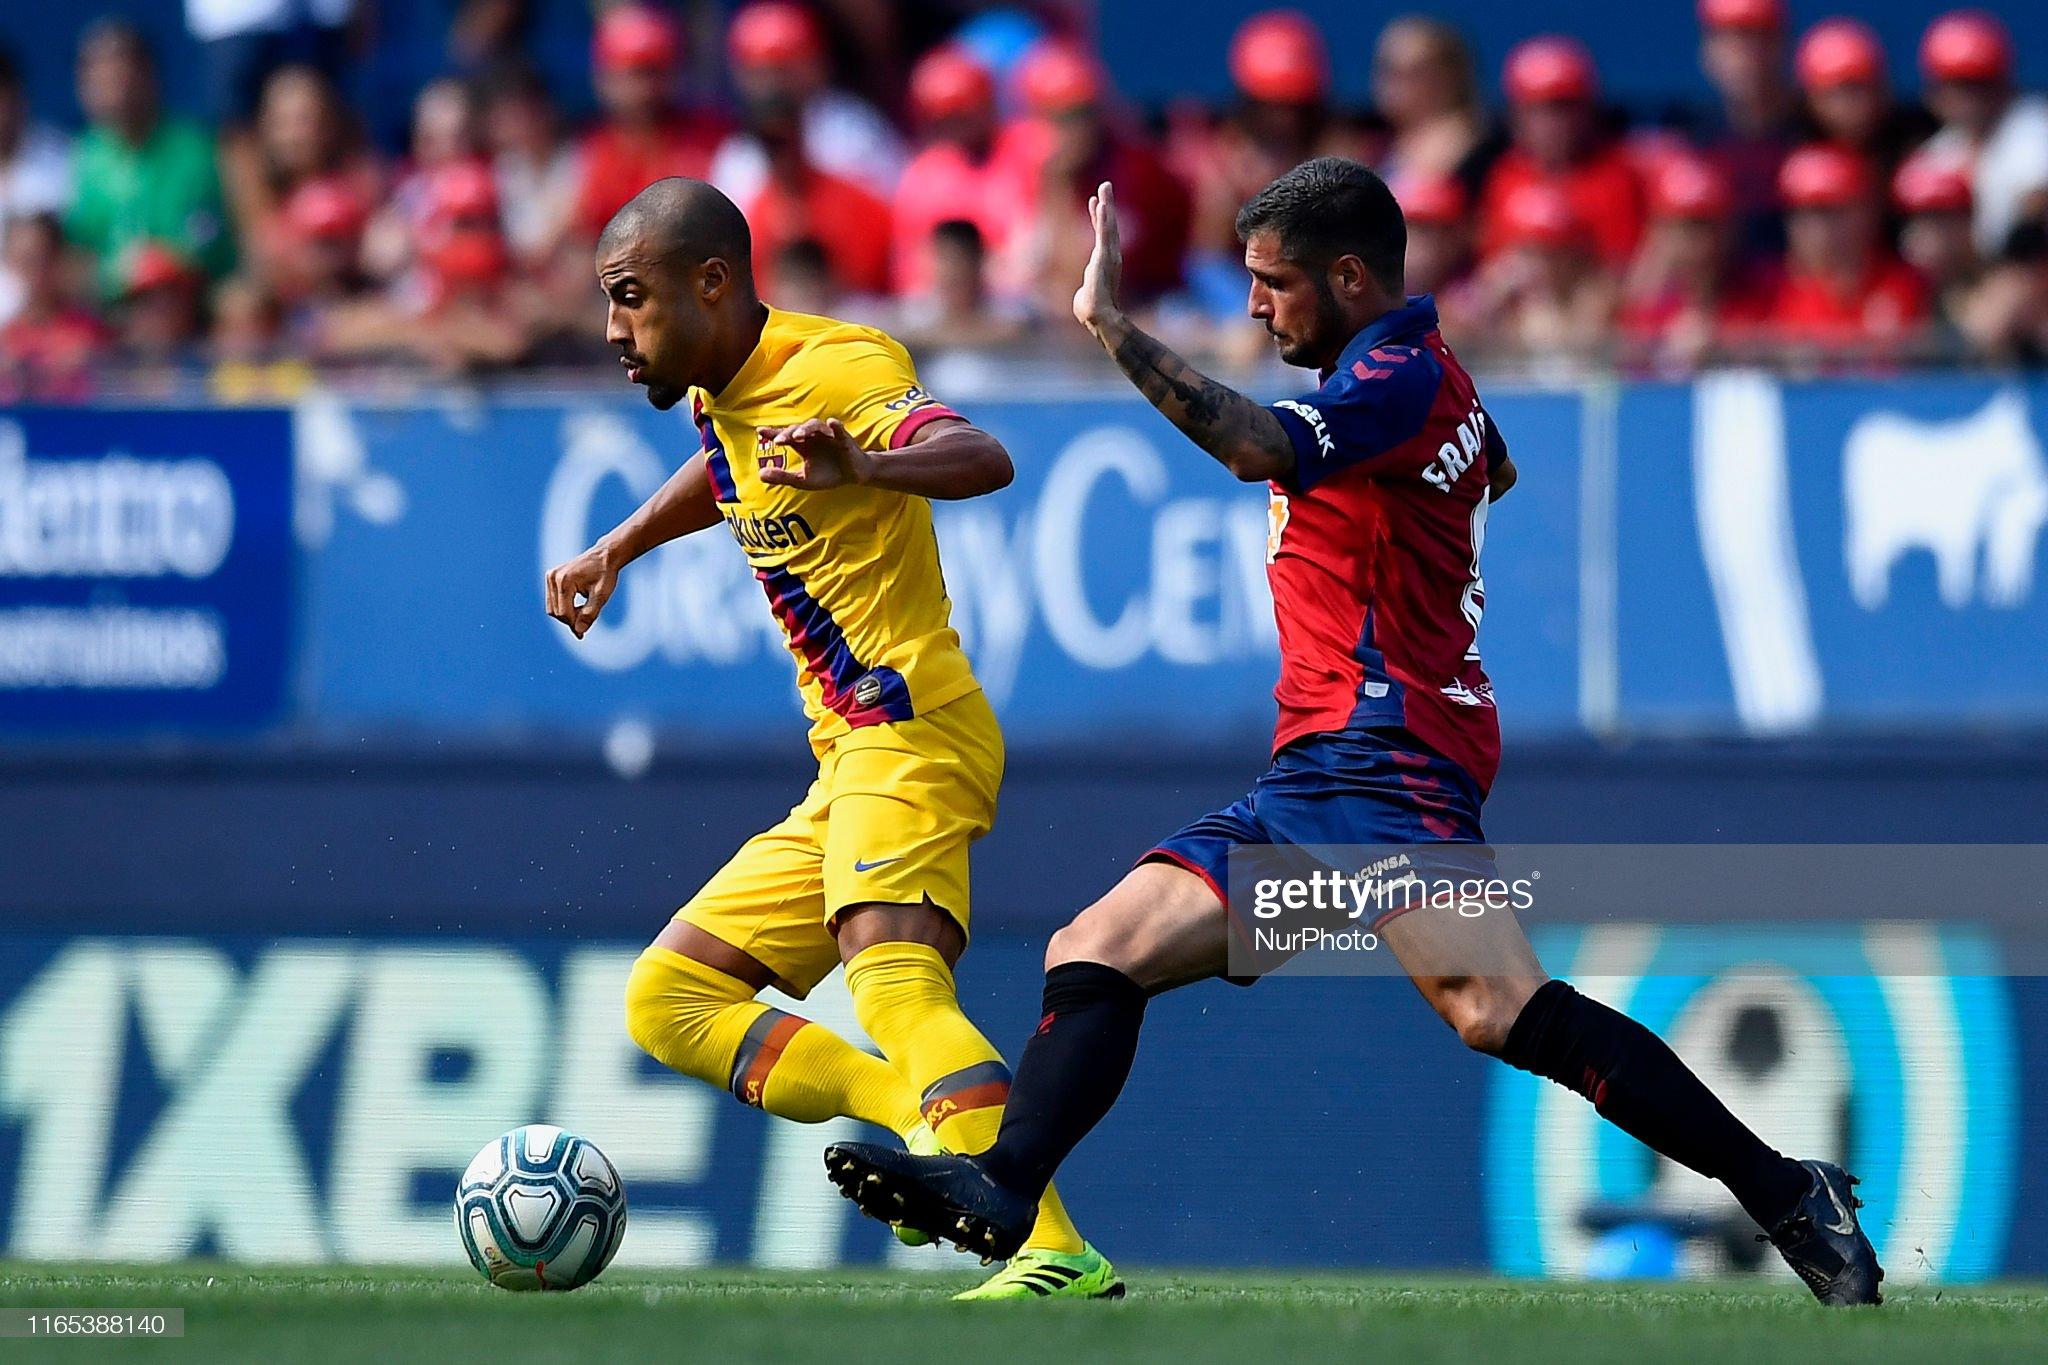 صور مباراة : أوساسونا - برشلونة 2-2 ( 31-08-2019 )  Rafinha-of-barcelona-and-fran-merida-of-osasuna-competes-for-the-ball-picture-id1165388140?s=2048x2048